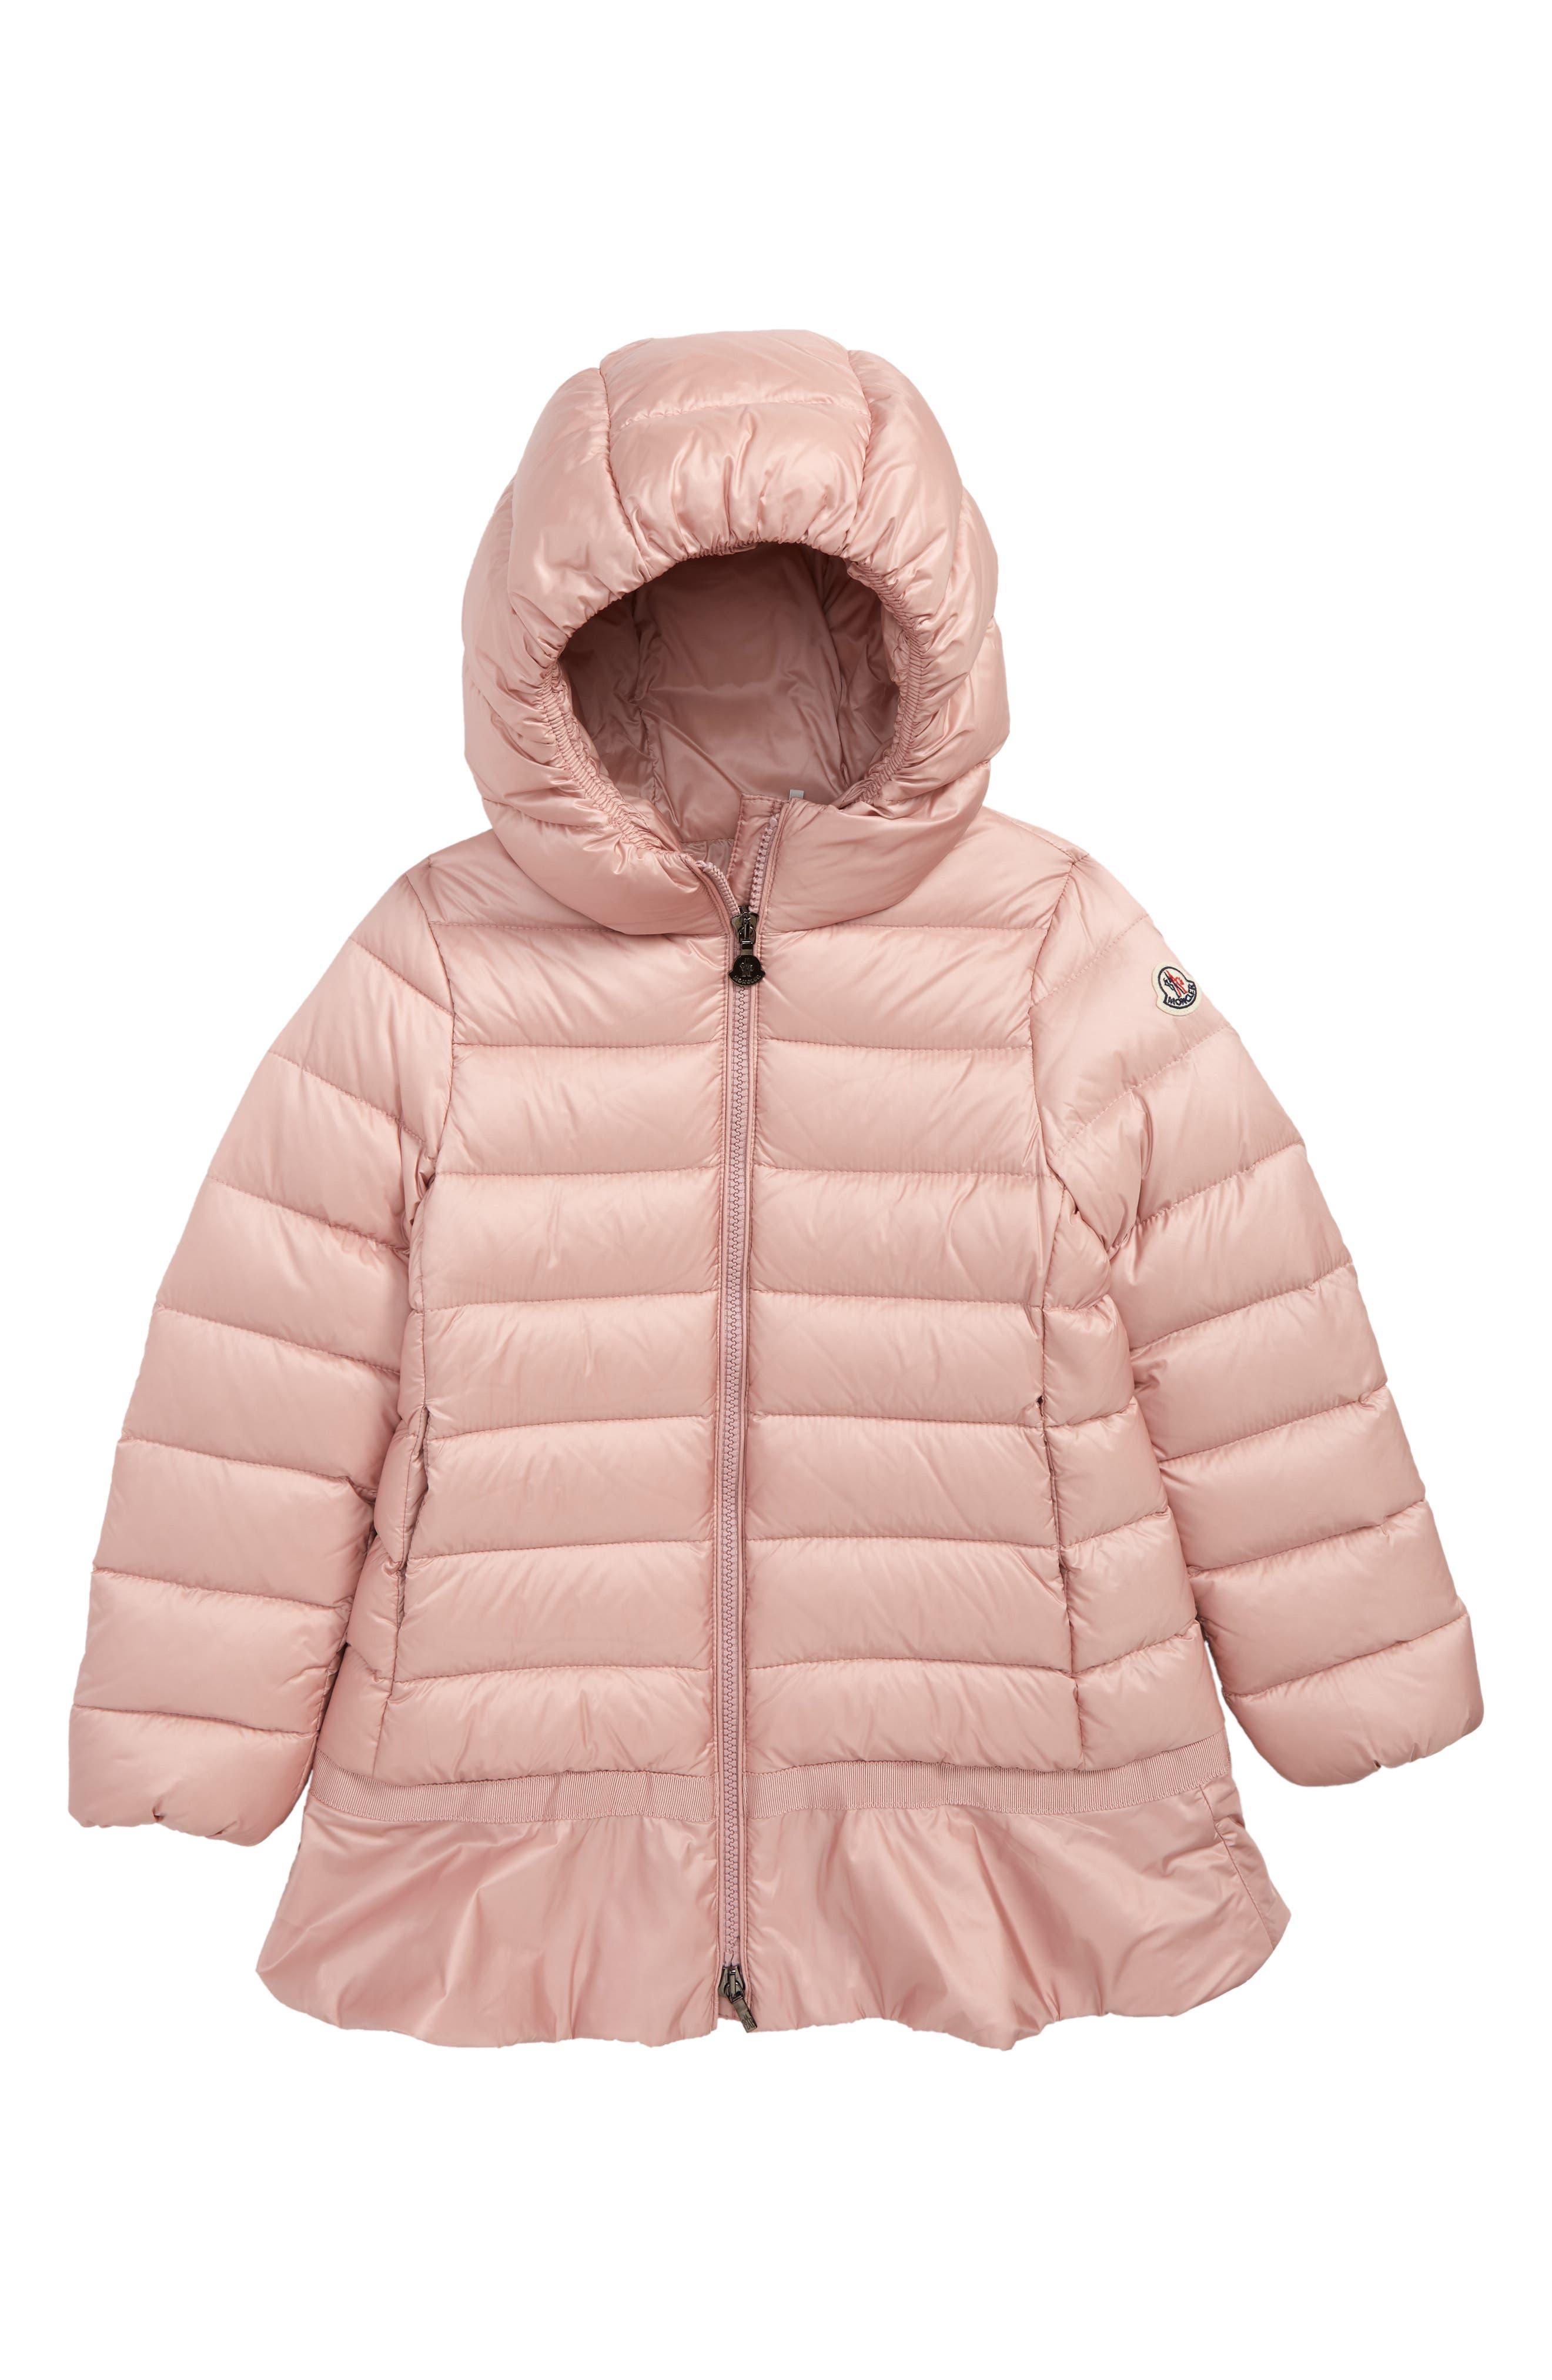 Nadra Hooded Down Jacket,                         Main,                         color, LIGHT PINK